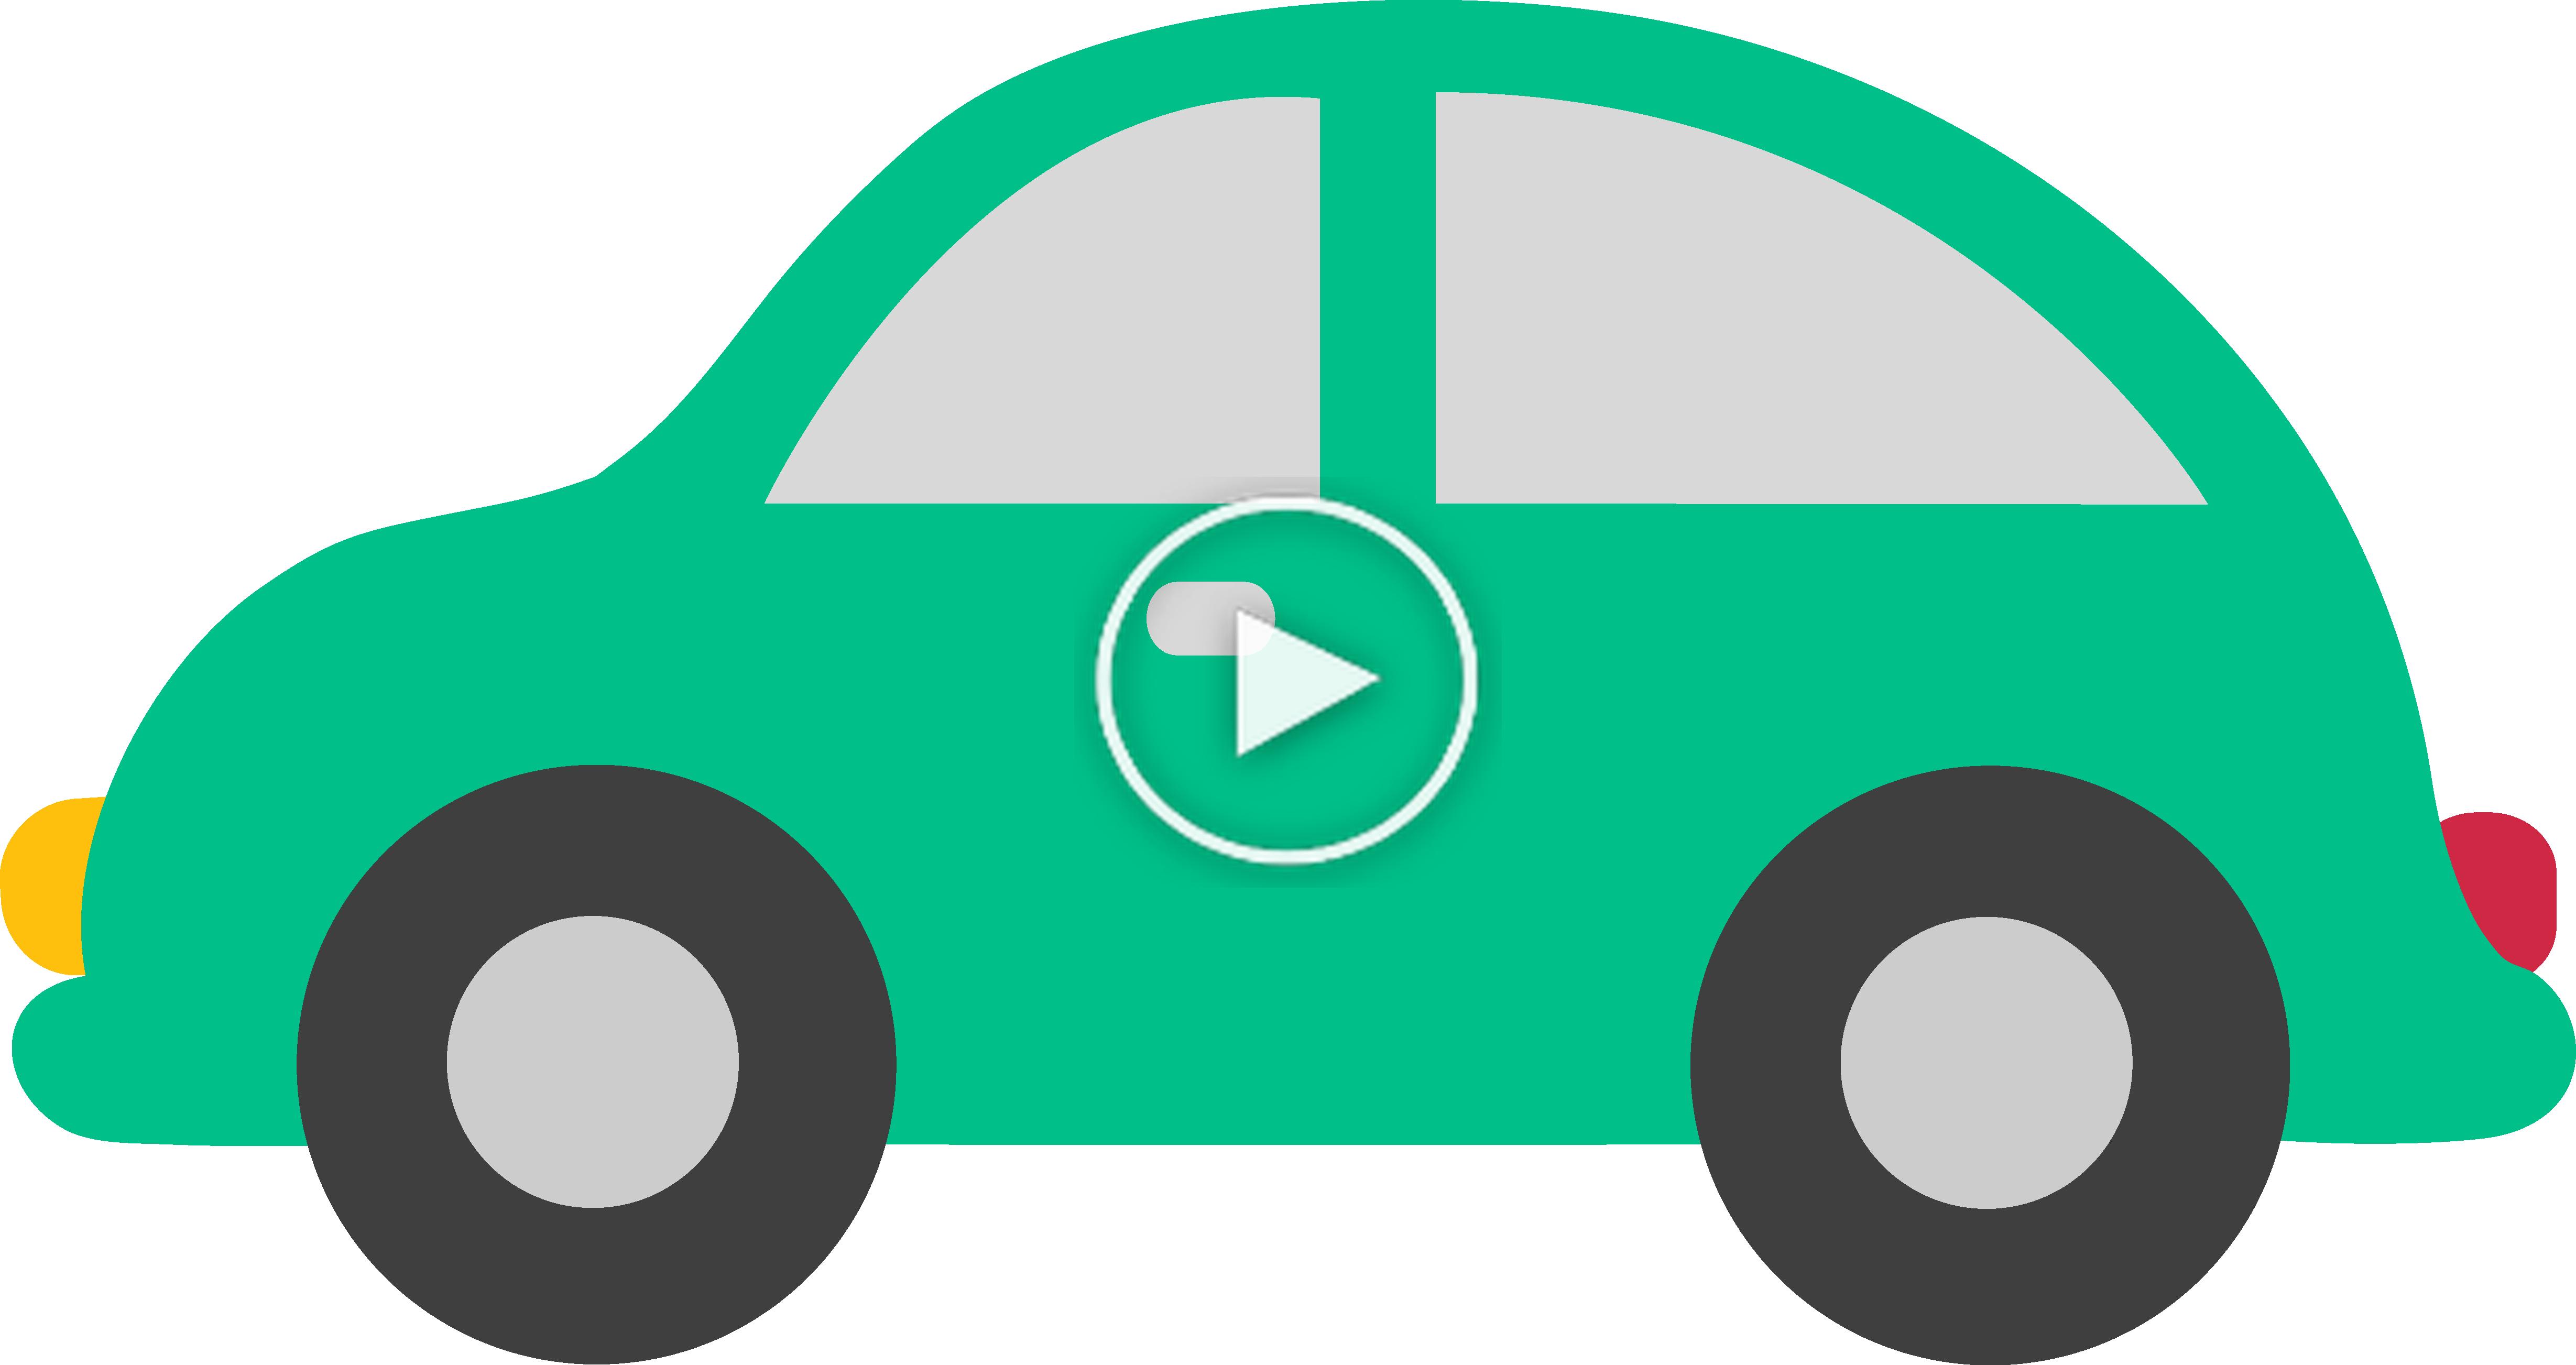 Free Clicpart Cartoon Cars Clipart The Cliparts Car Cartoon Clip Art Cartoon [ 2605 x 4916 Pixel ]